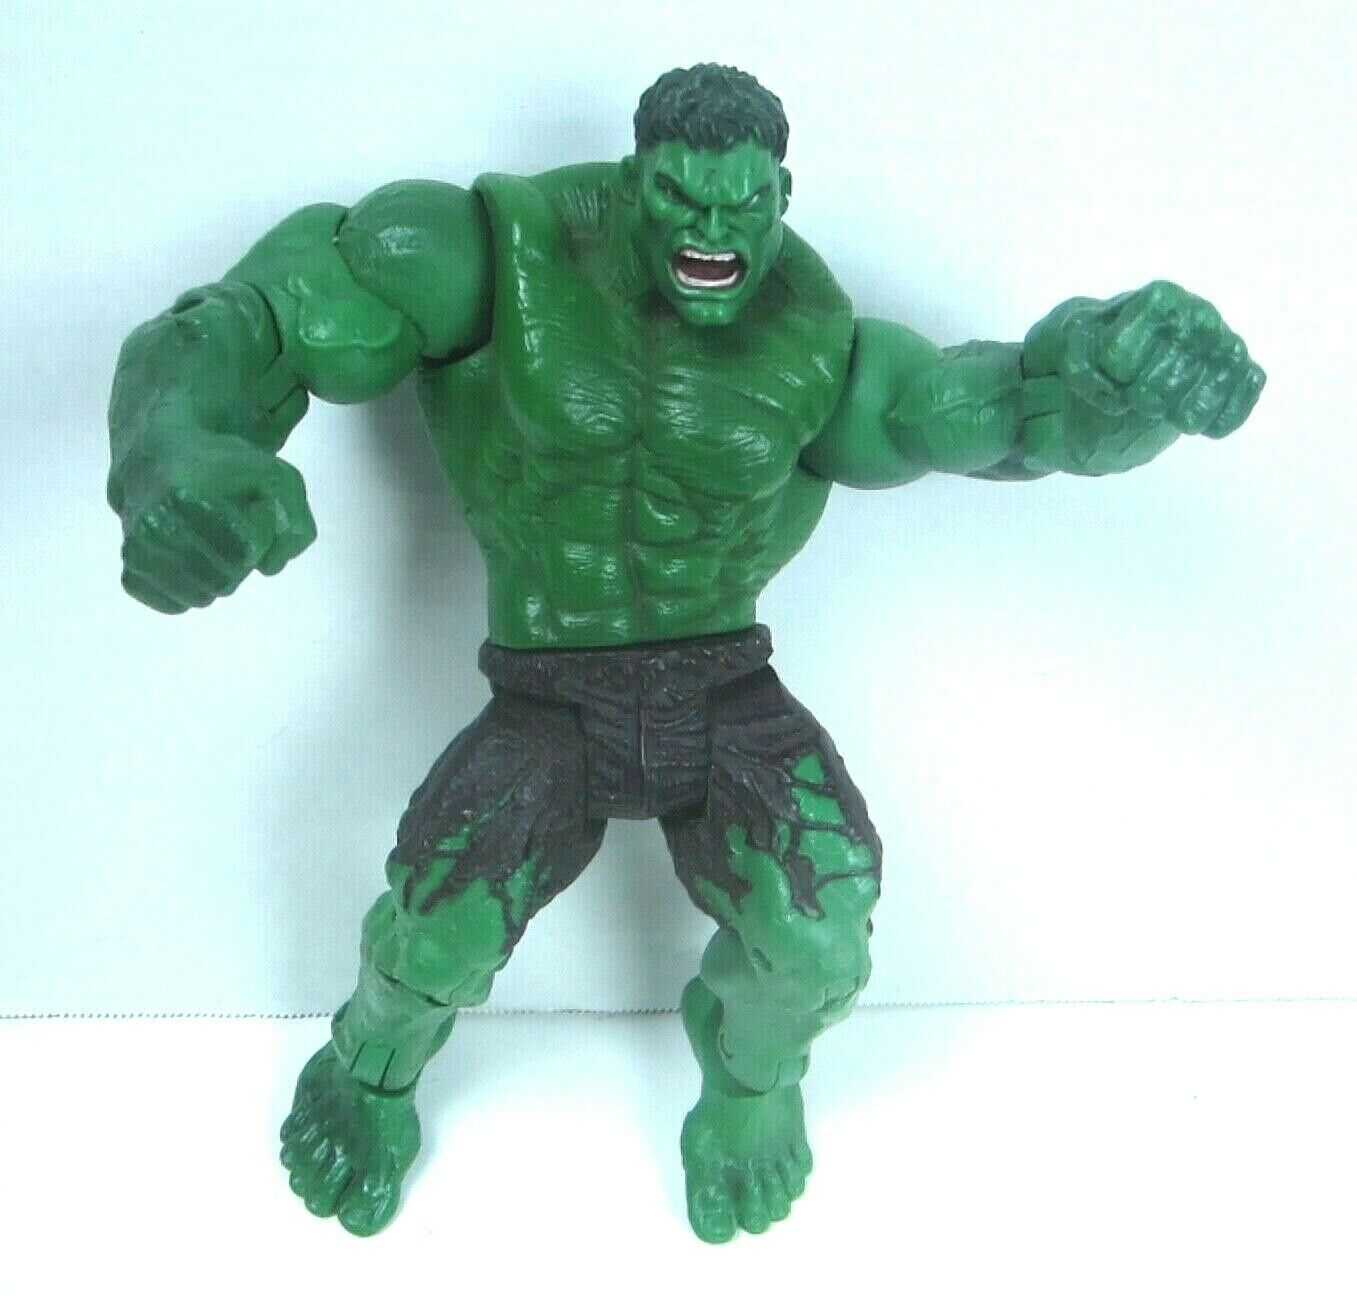 "2003 Hulk the Movie Action Figure Universal Marvel Throwing Smash Arms 8"" image 2"